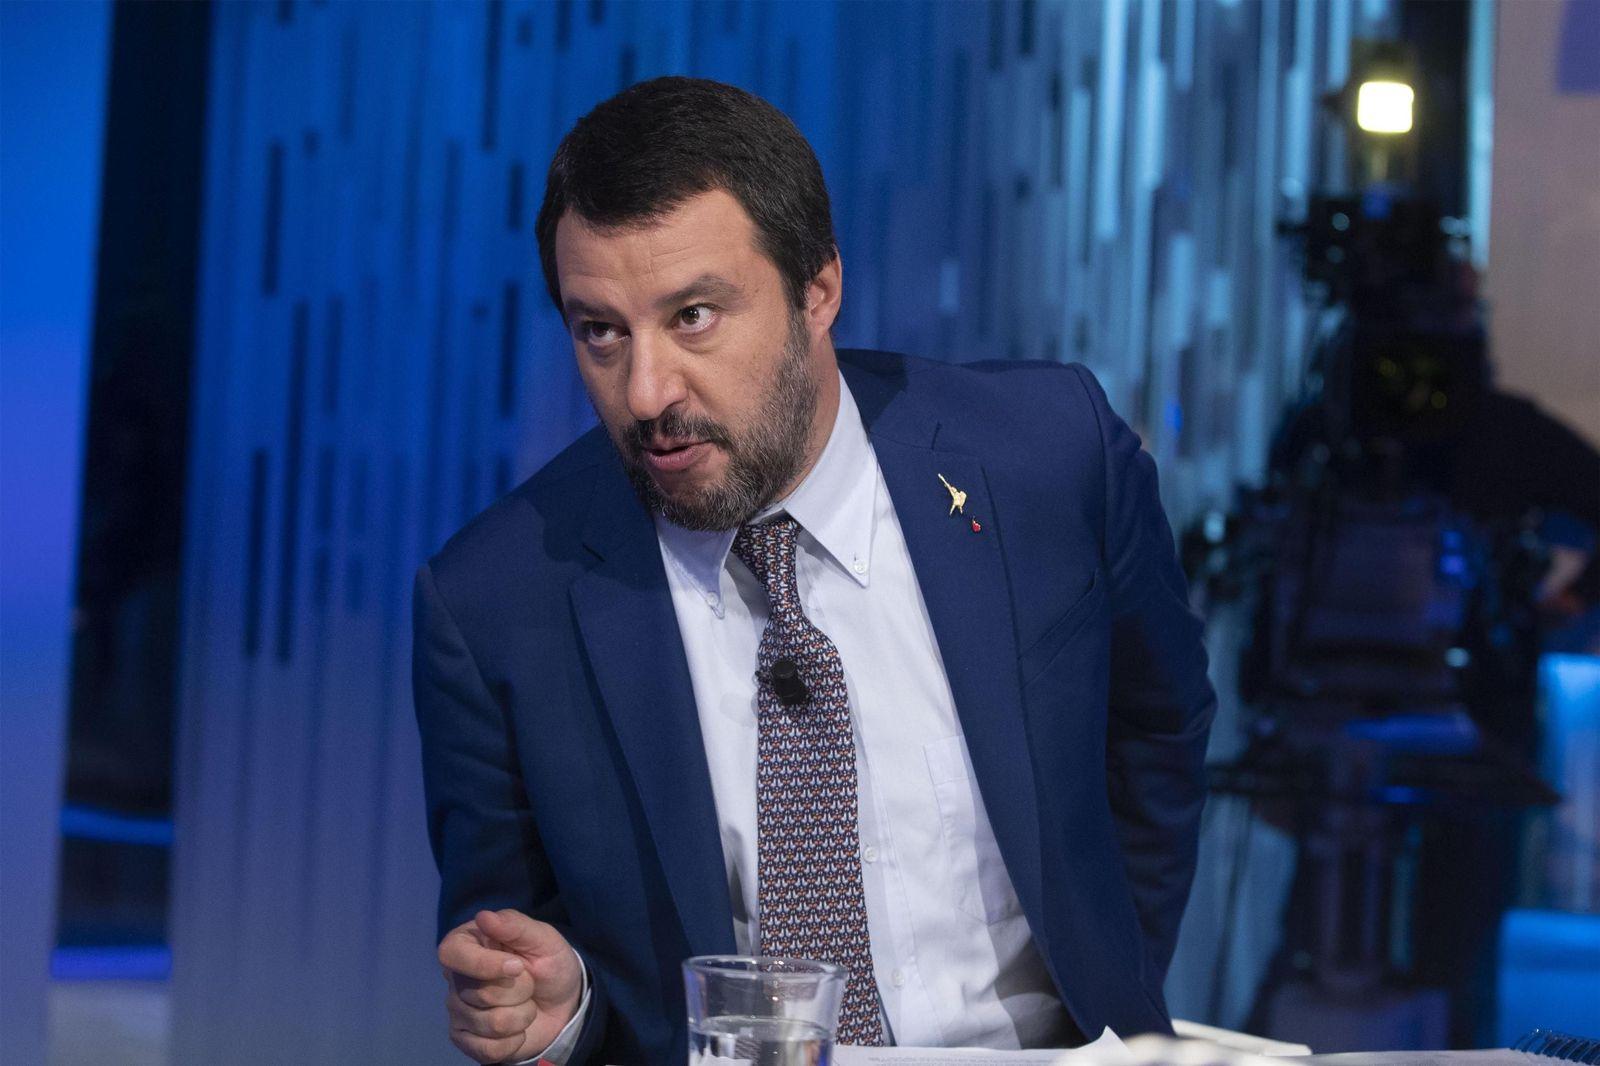 Metteo Salvini